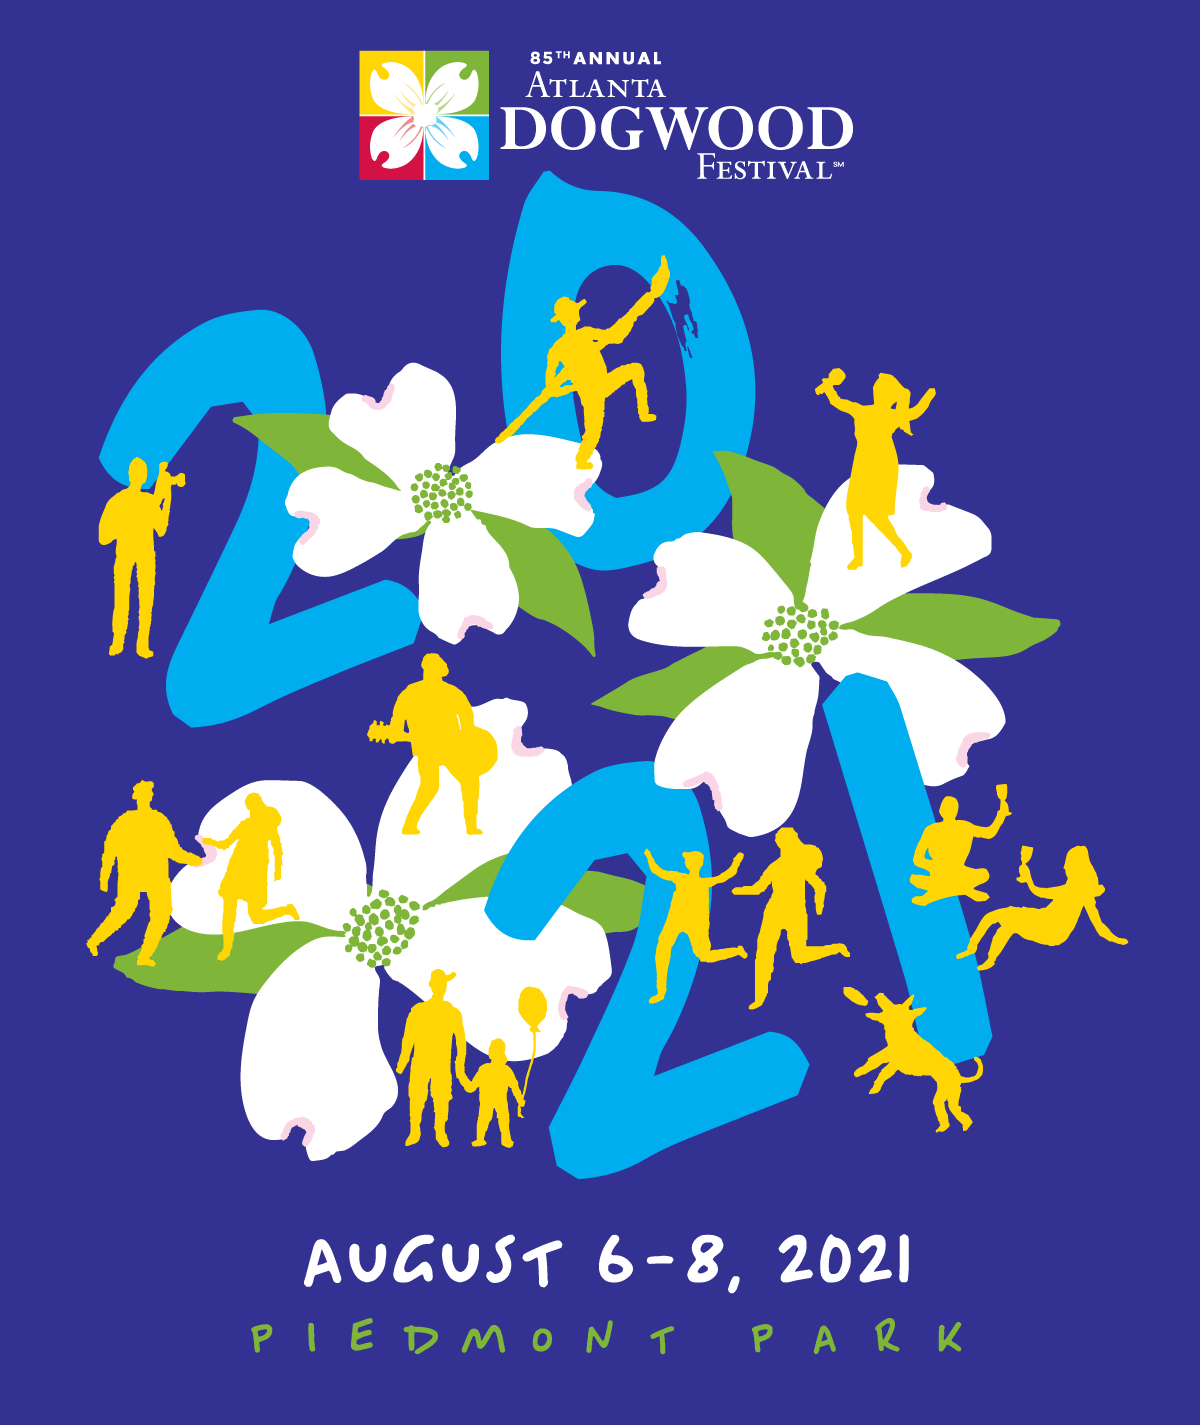 85th Annual Atlanta Dogwood Festival Program Guide